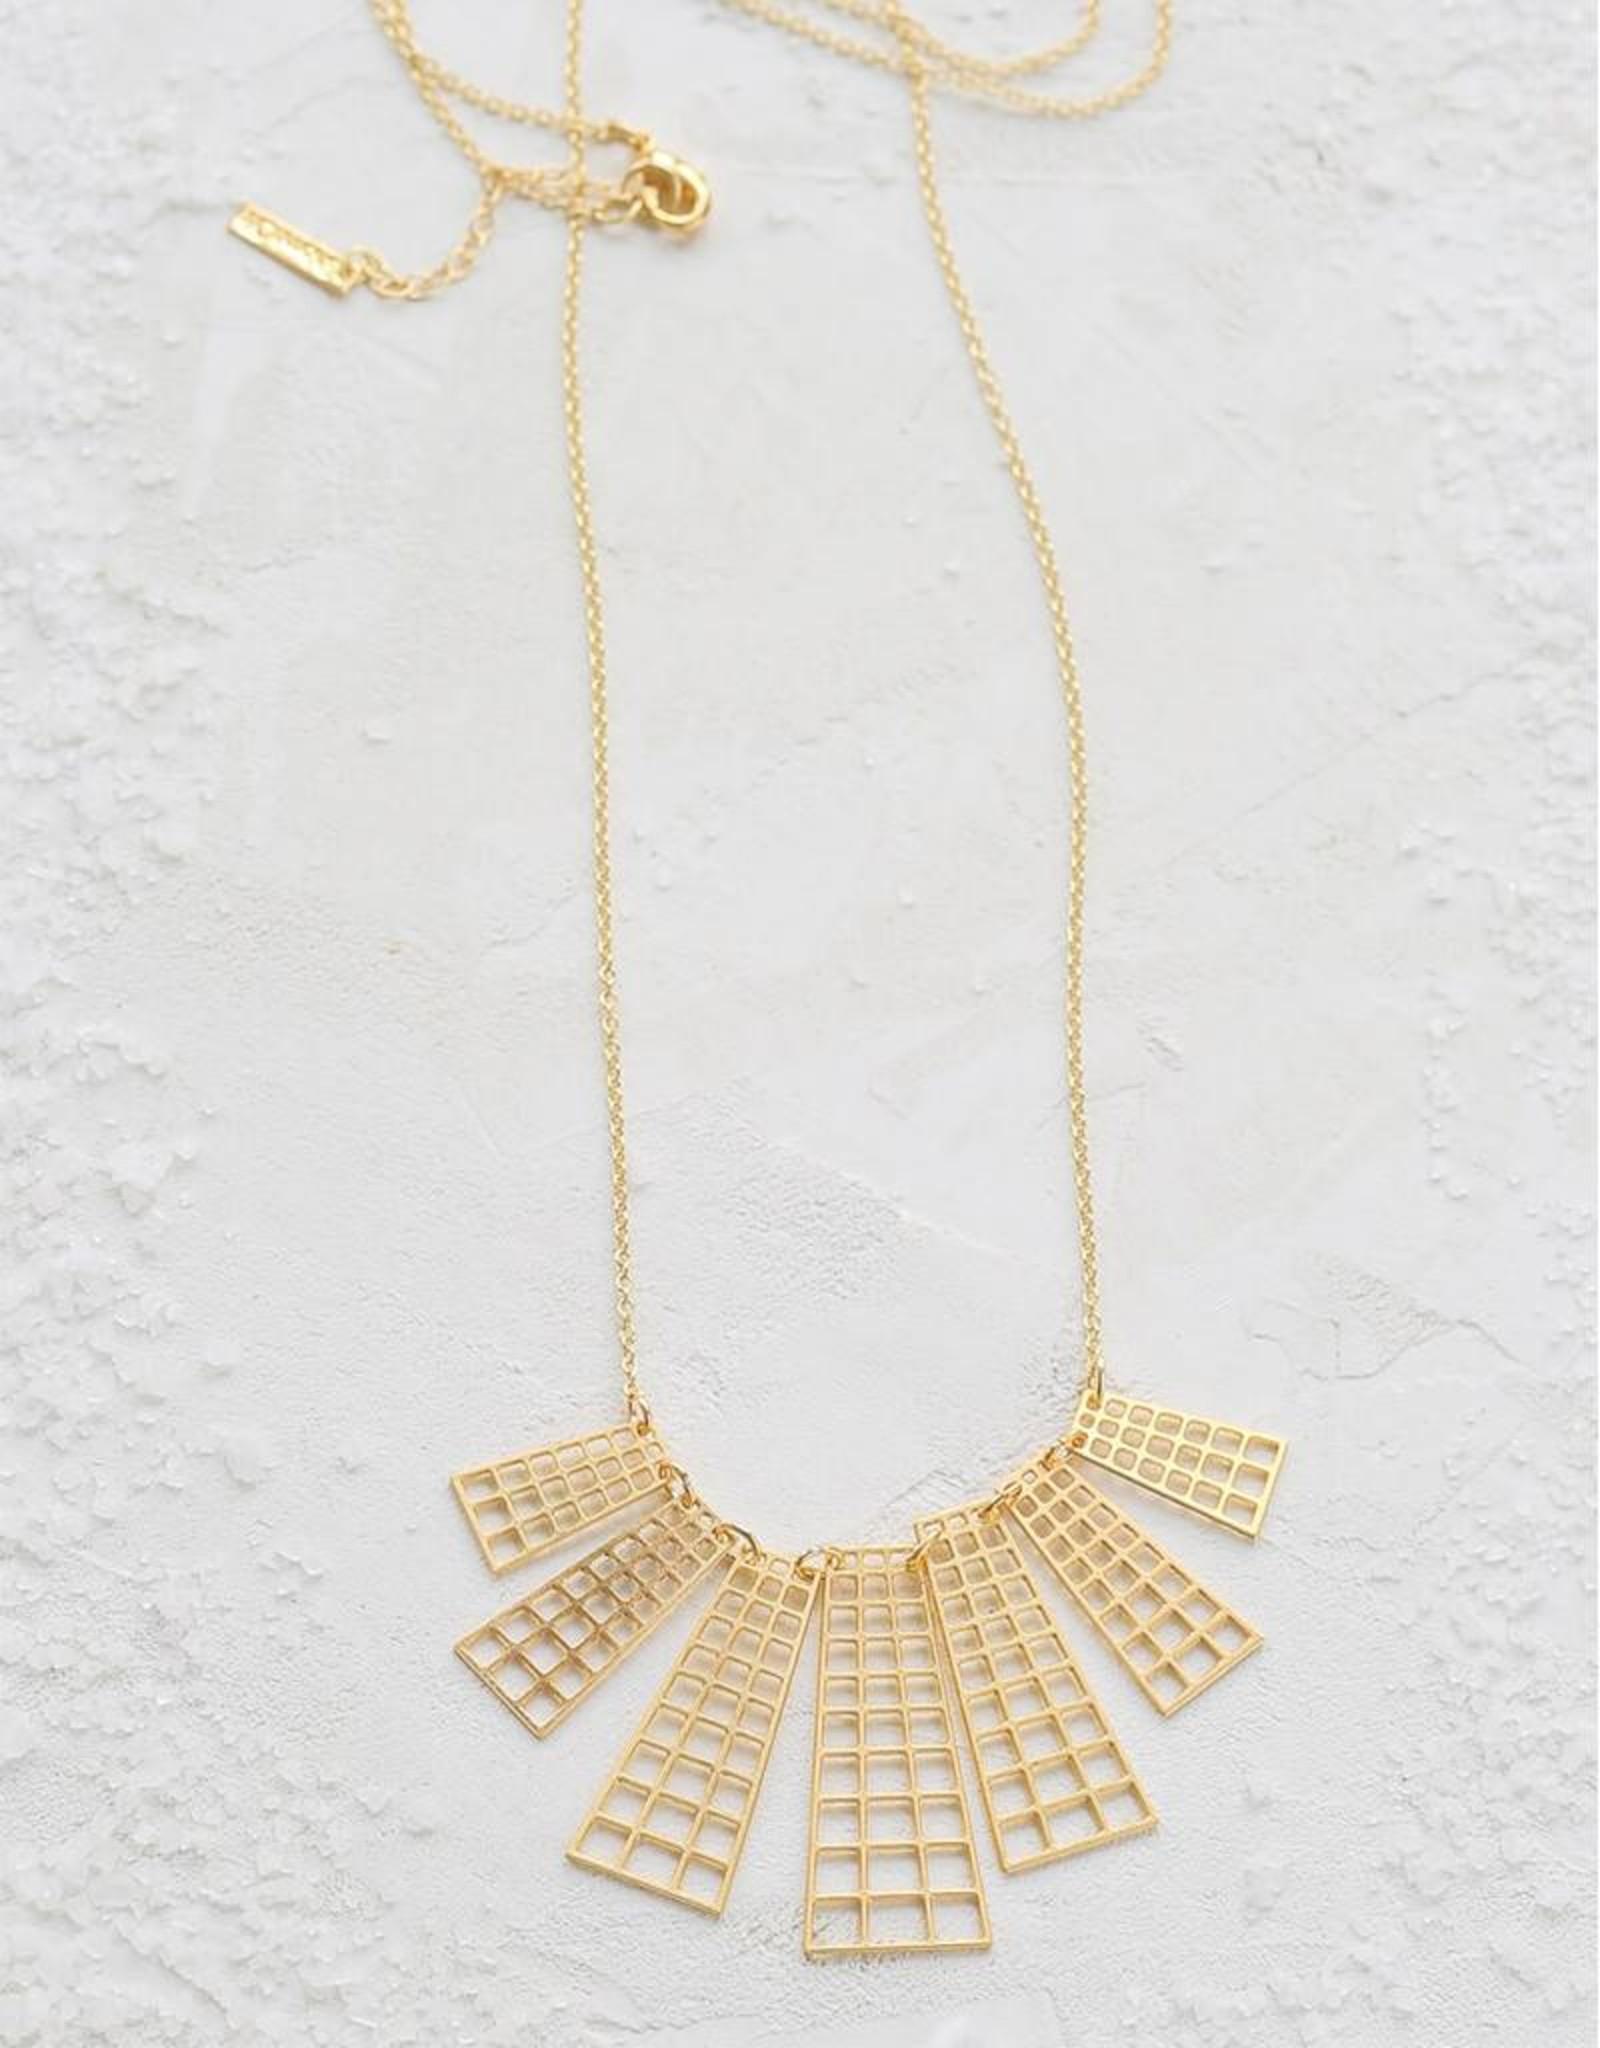 Shlomit Ofir Satellite necklace